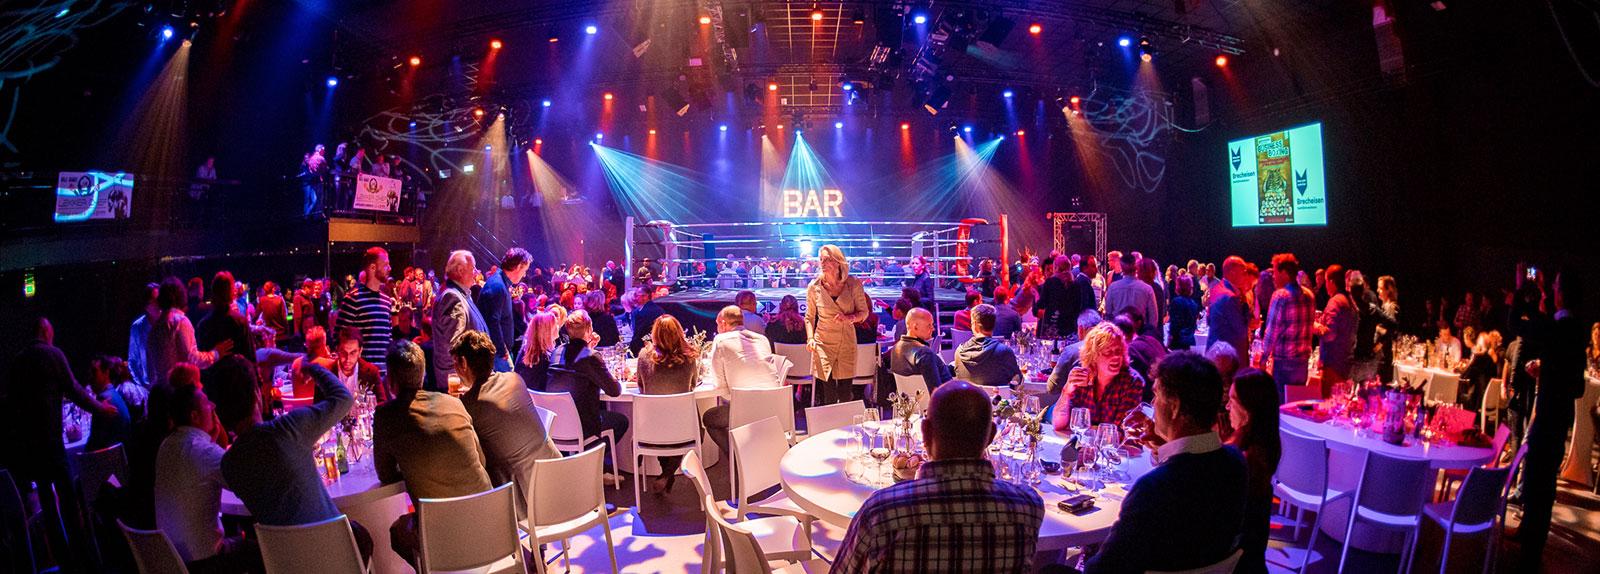 Business-Boxing-Gala.jpg